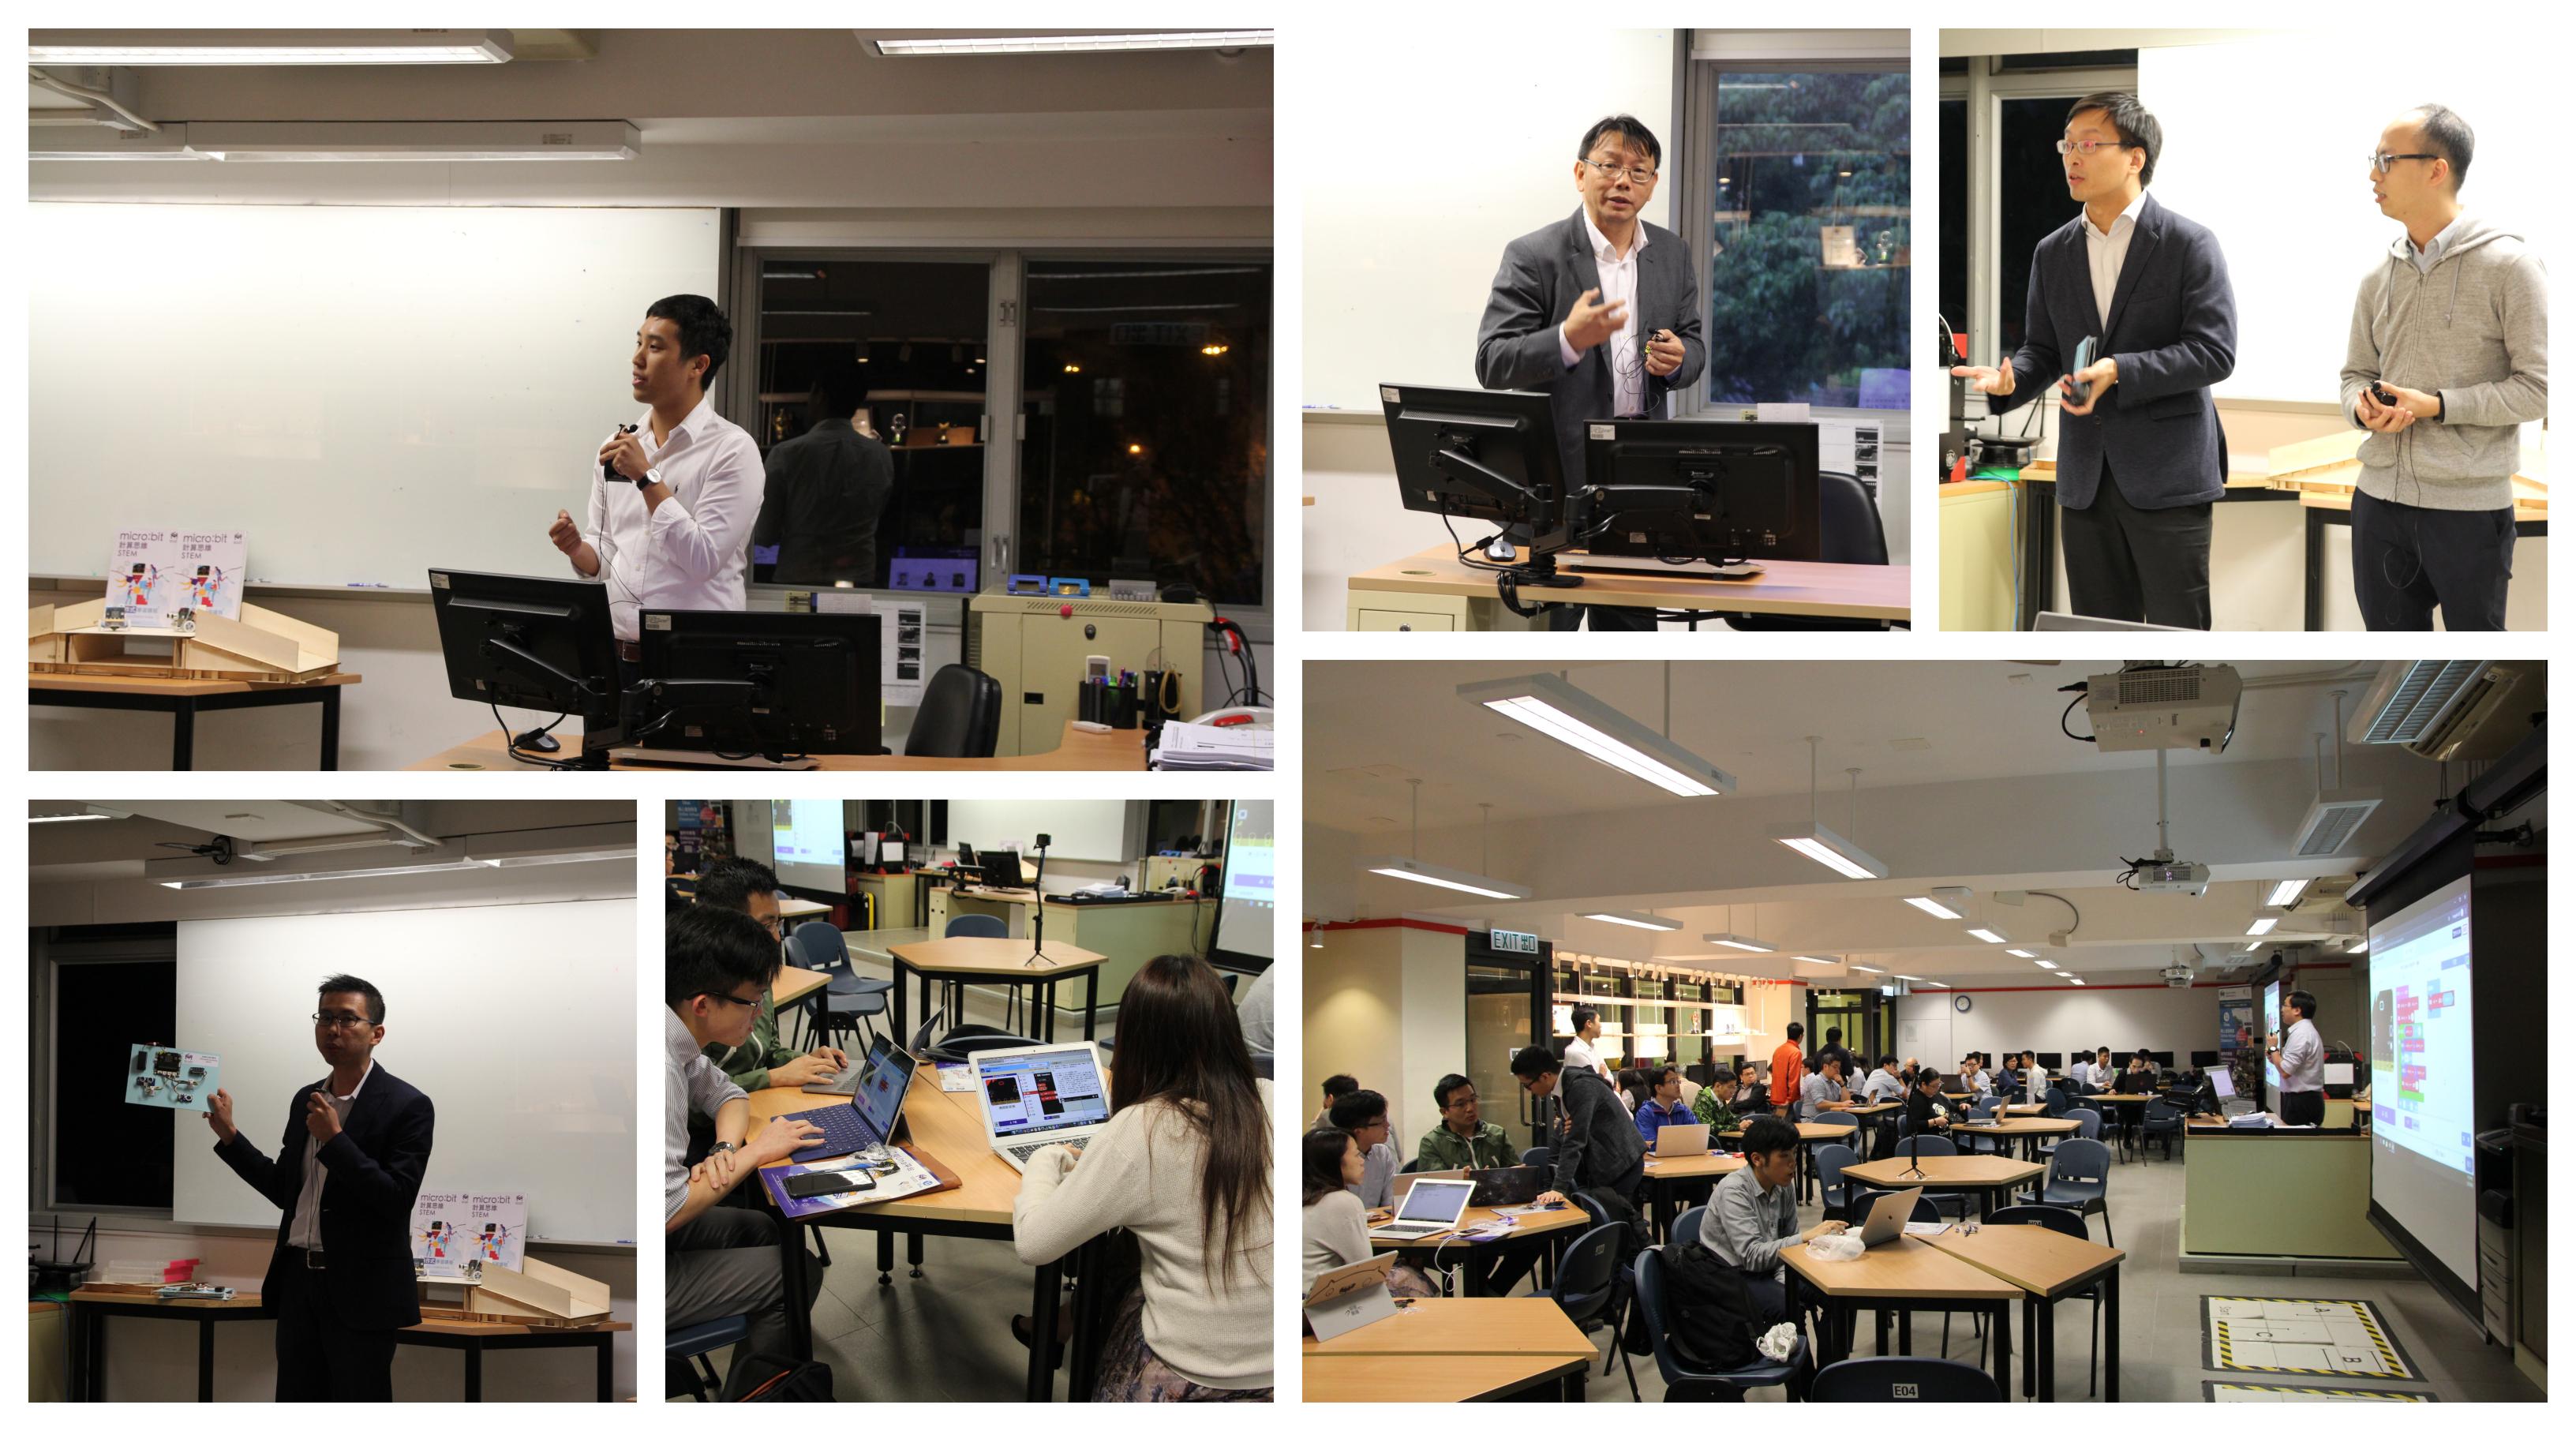 MagiCube Una AiTLE + MagiCube/ Workshop on Designing a micro:bit x STEM Collaboration Activity